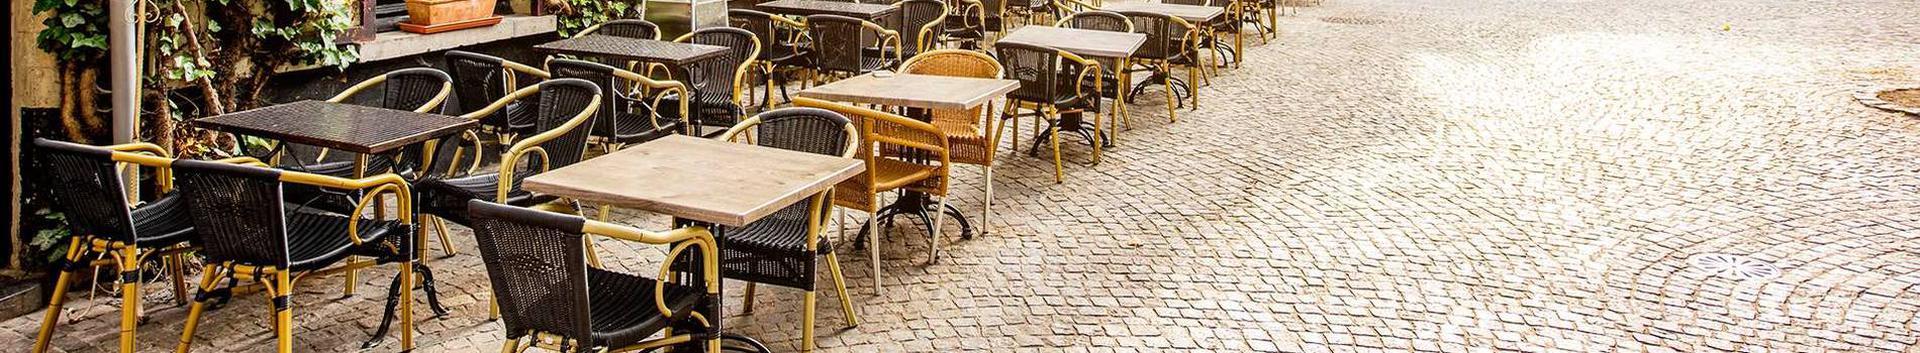 56101_toitlustus-restoran-jm-_17598290_xl.jpg